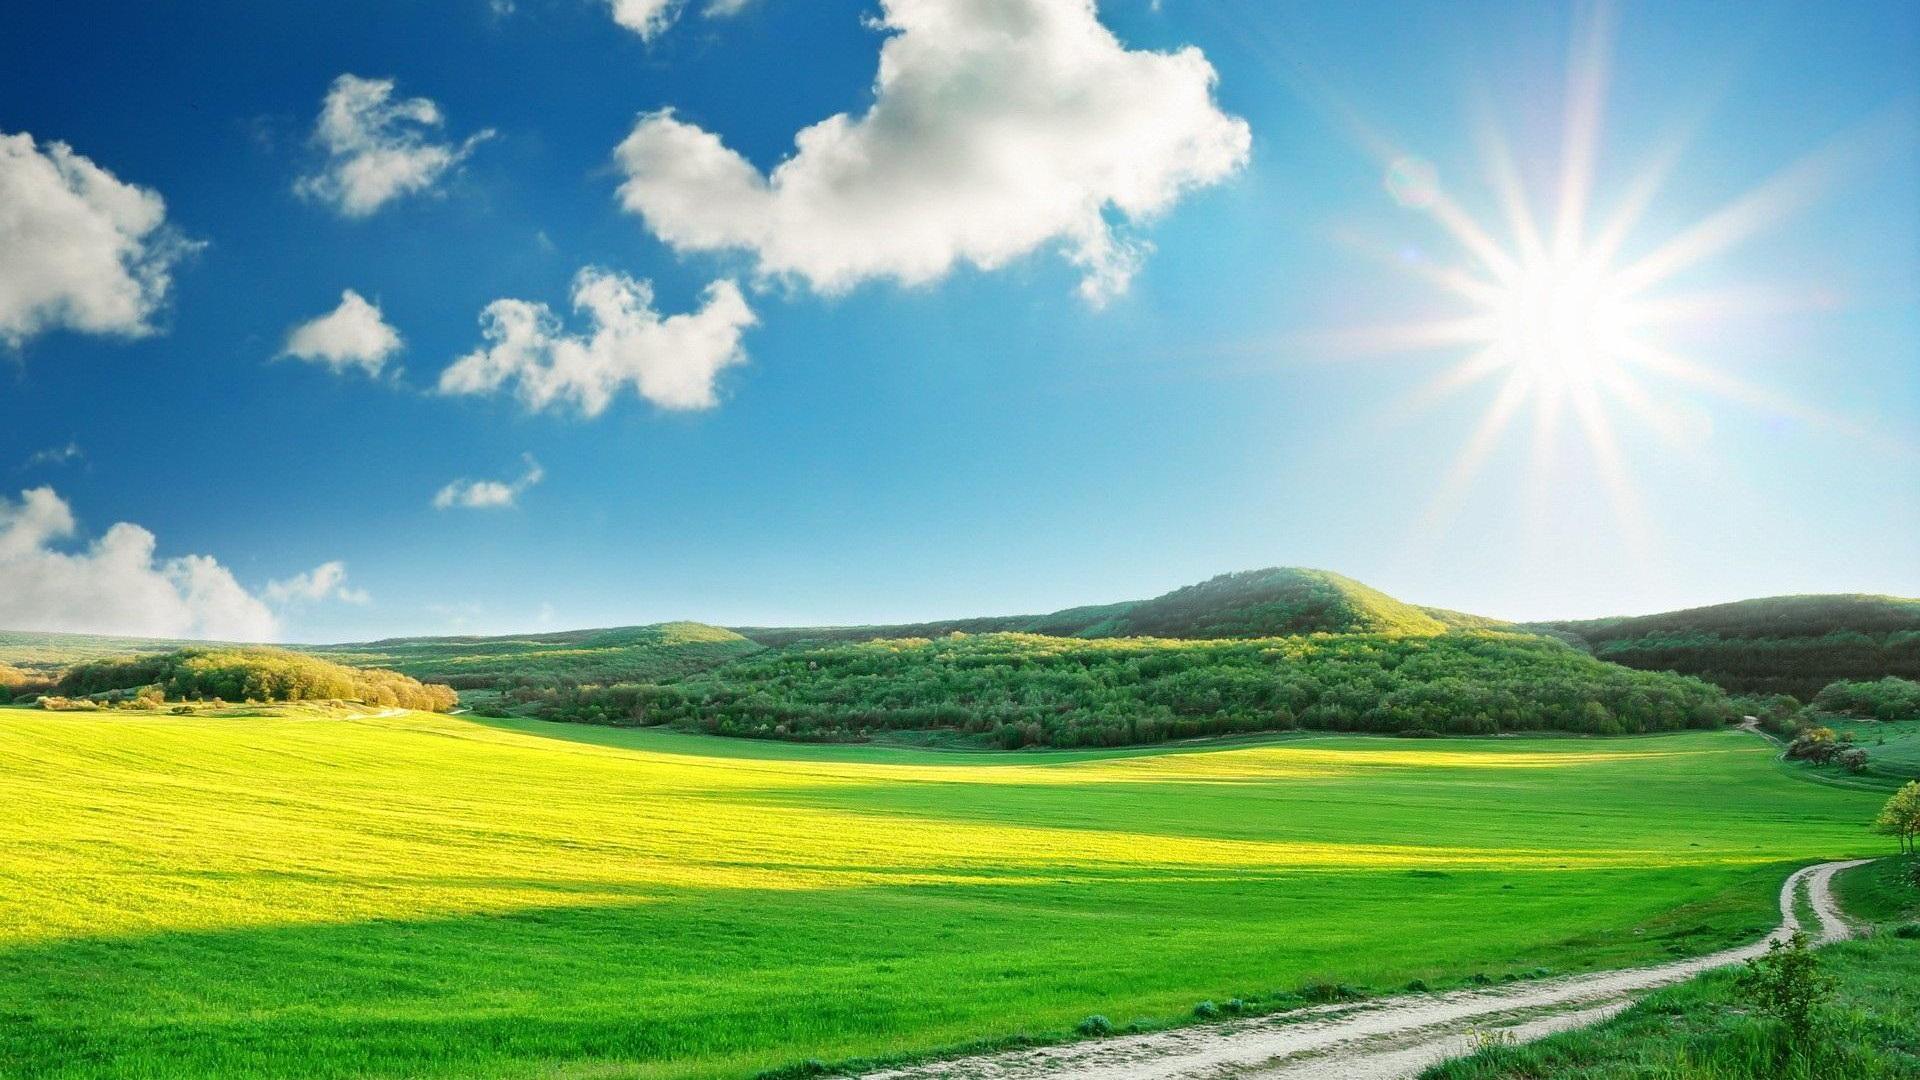 Amazing Sunny Day Wallpaper